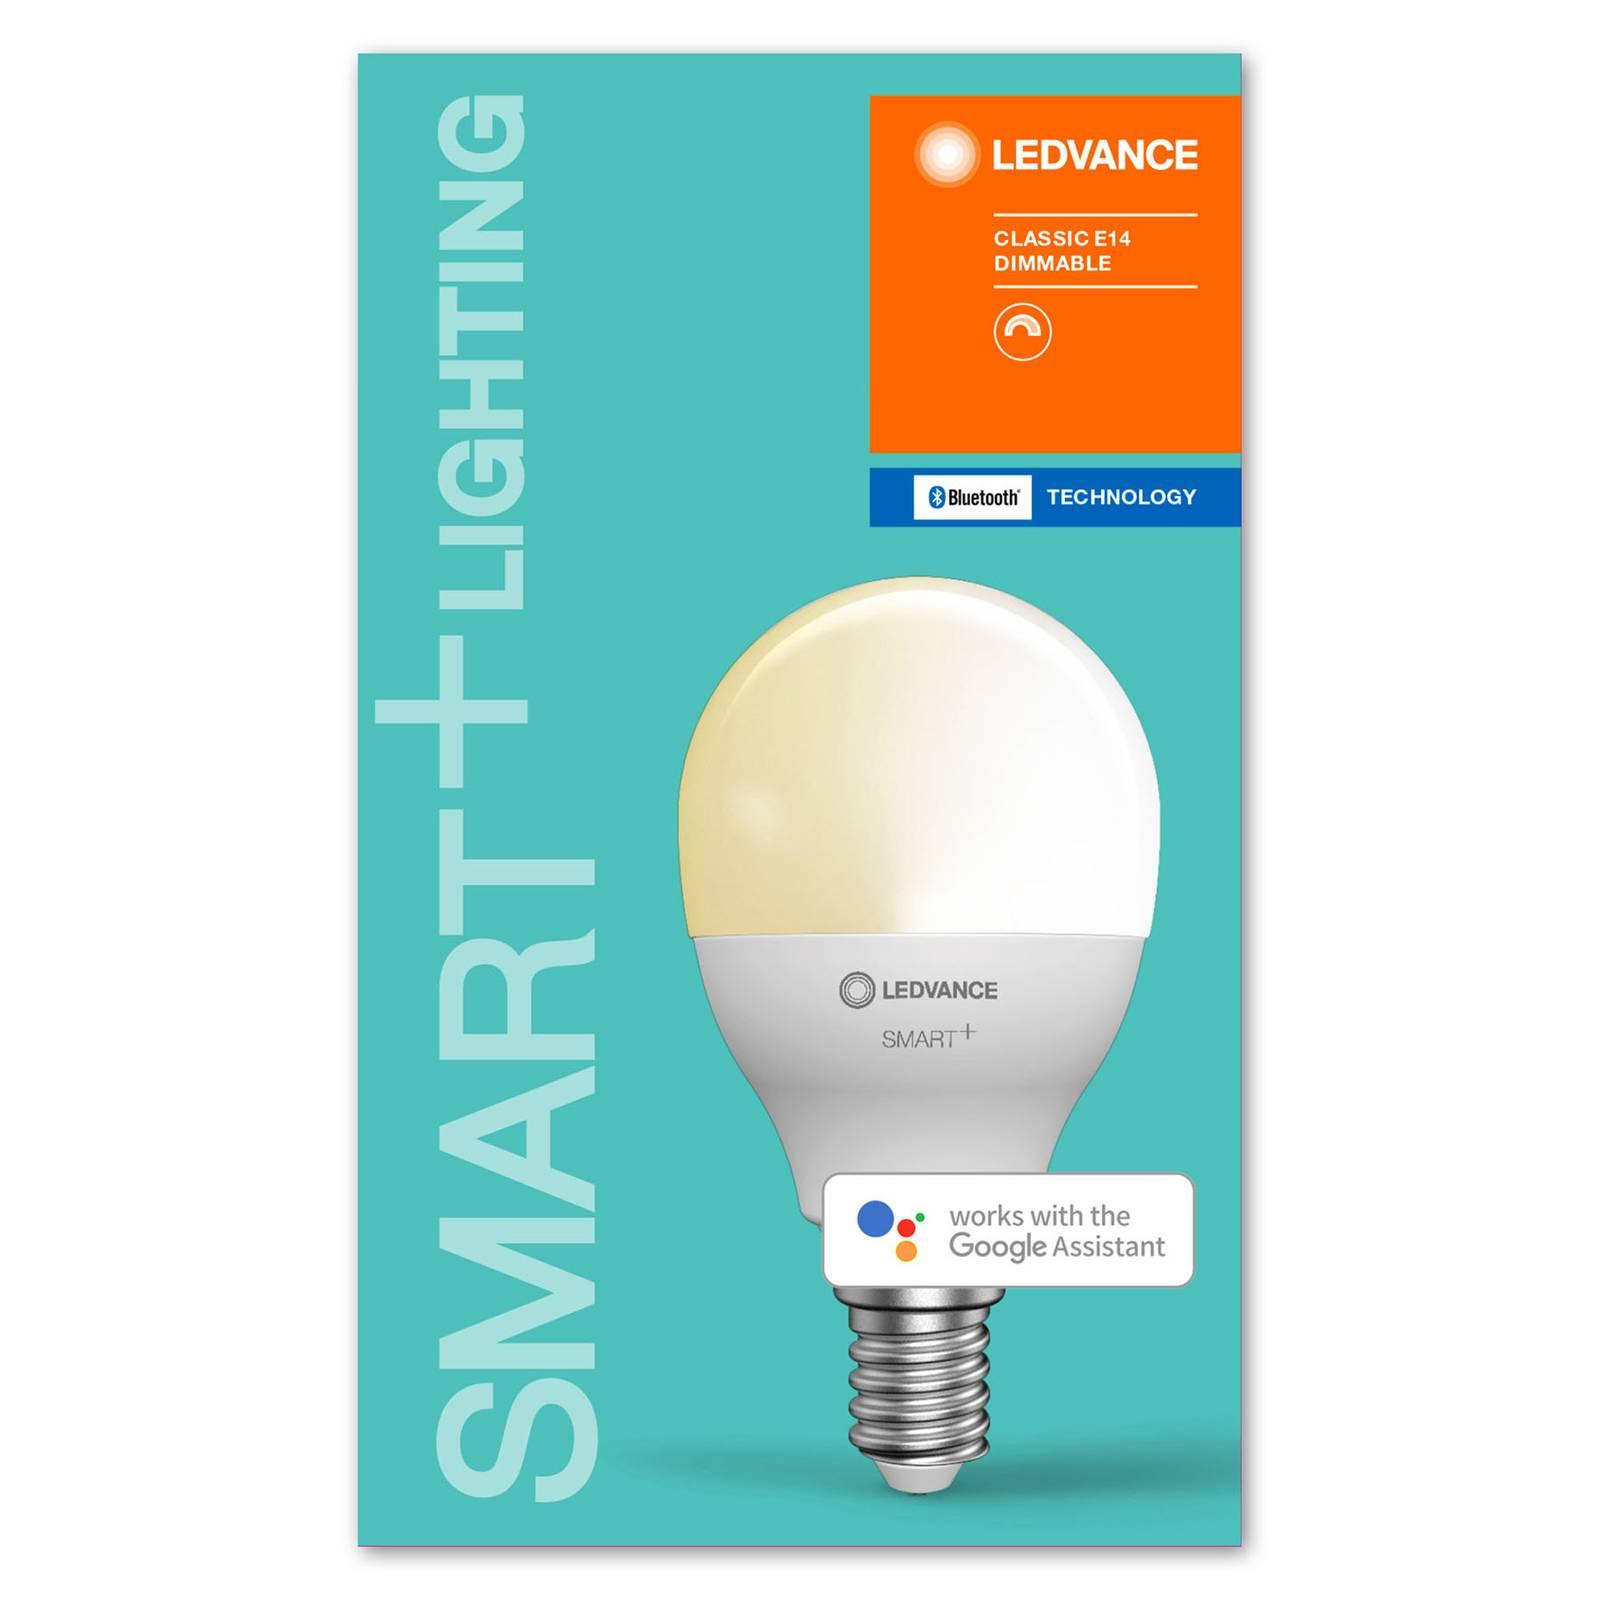 LEDVANCE SMART+ Bluetooth E14 LED pisara 5W 827